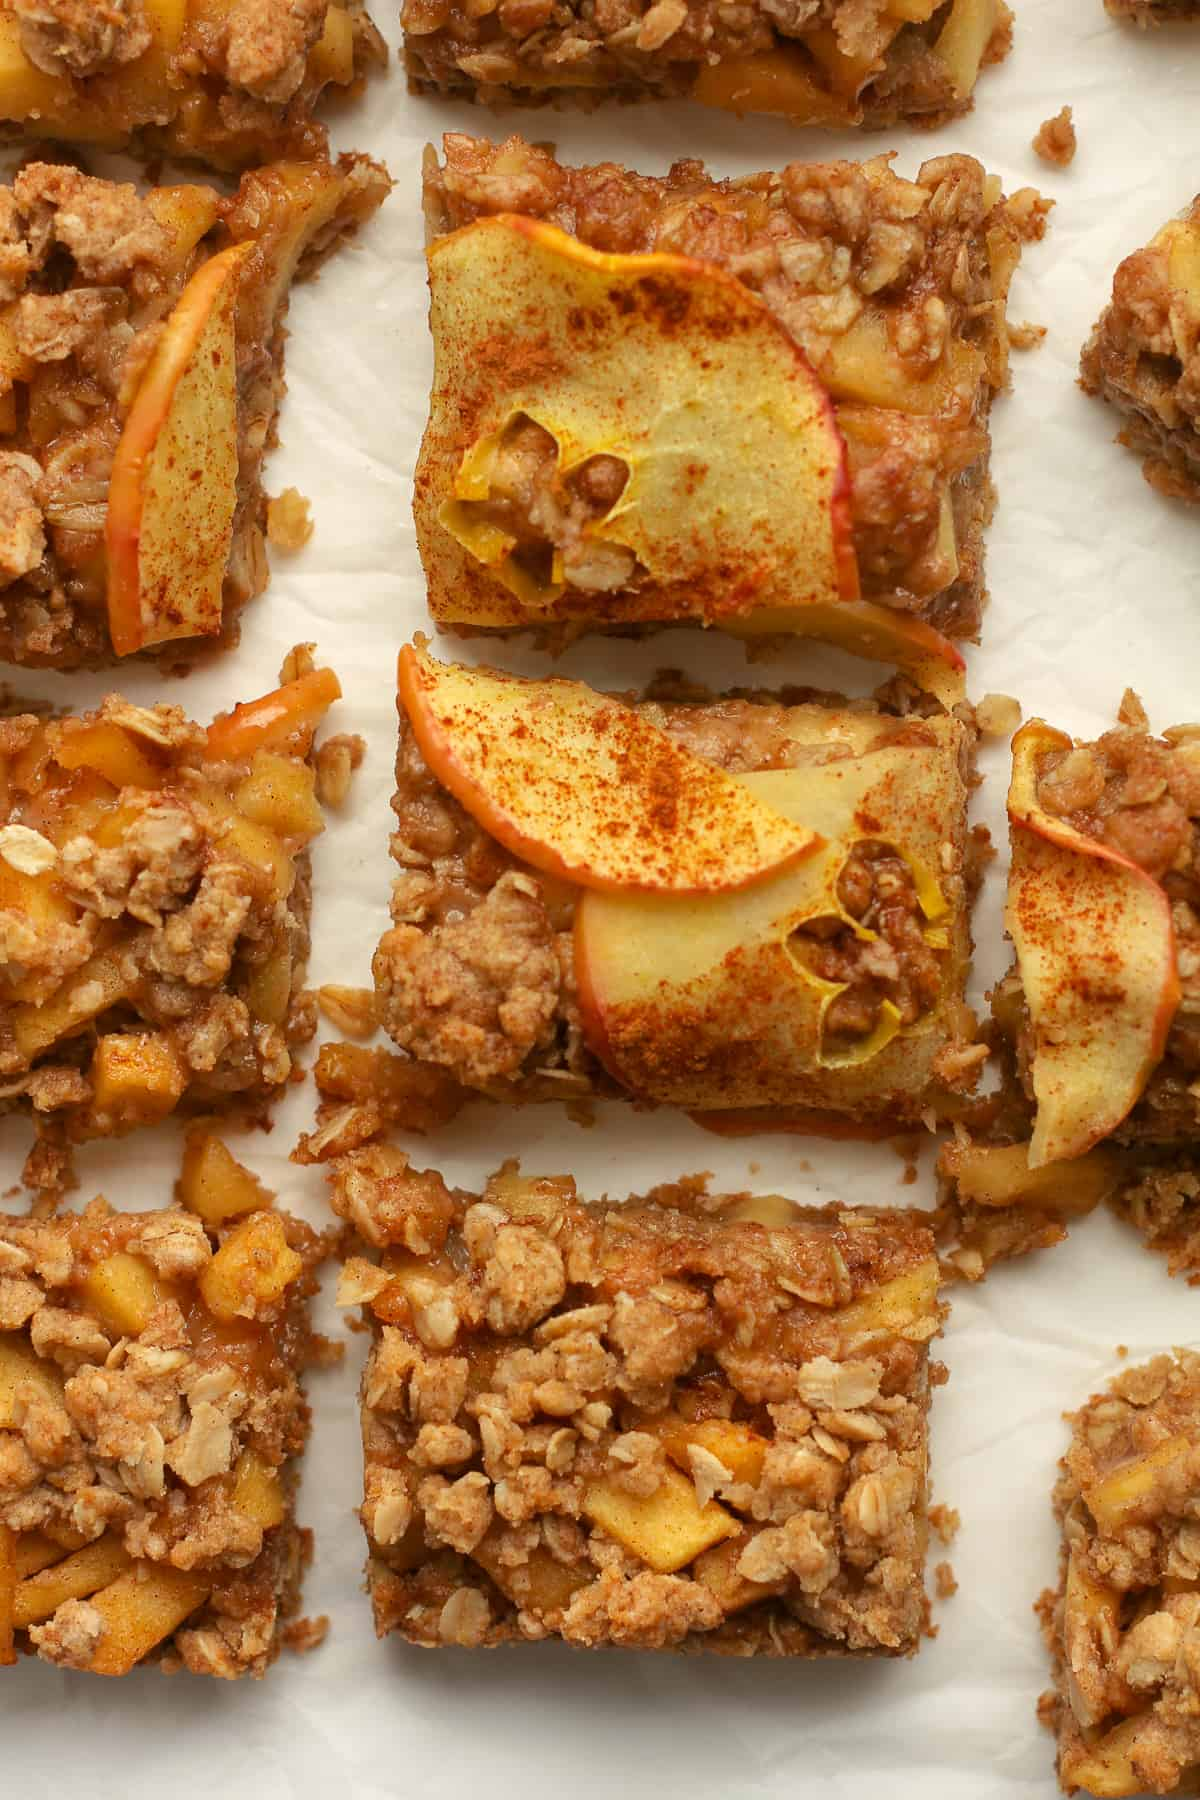 Closeup on some sliced apple crumb bars.